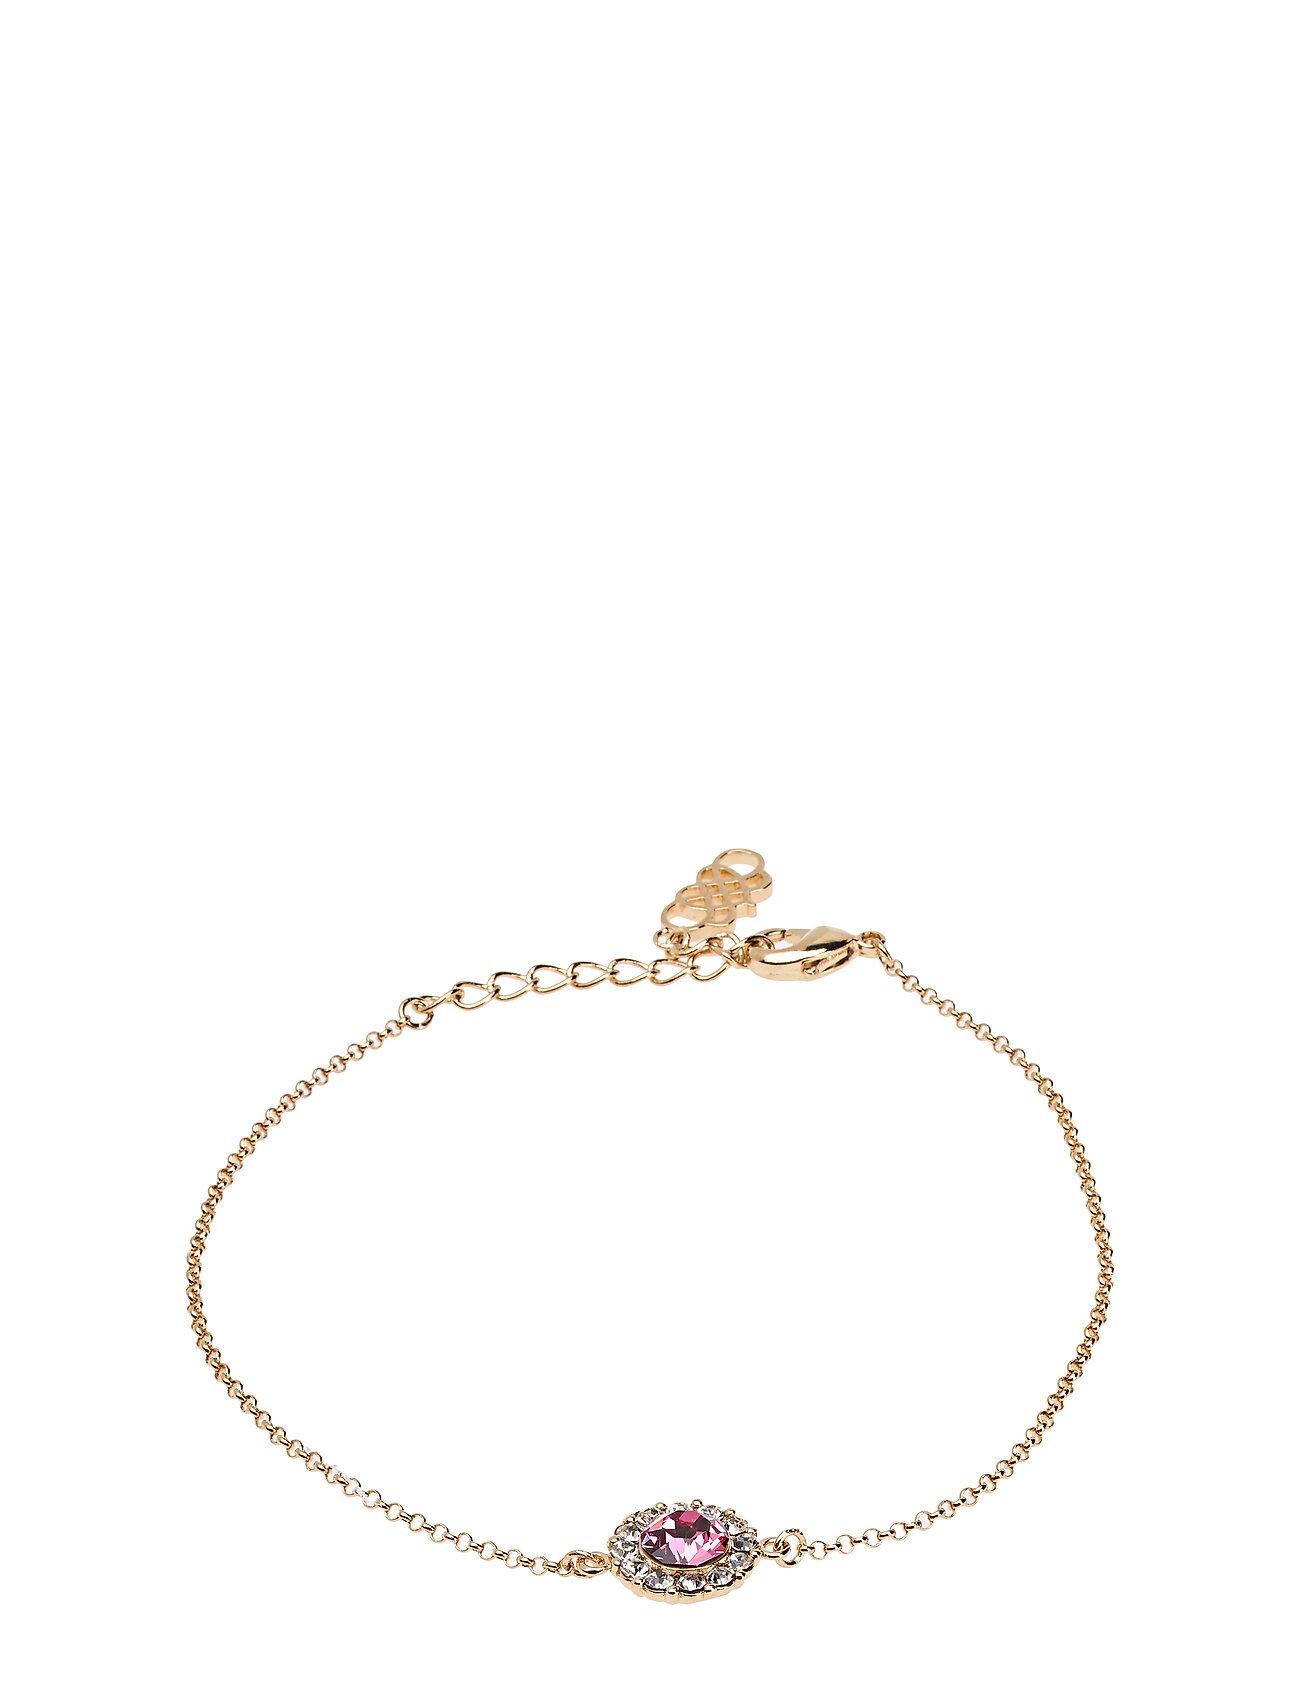 LILY AND ROSE Celeste Bracelet - Rose Accessories Jewellery Bracelets Chain Bracelets Vaaleanpunainen LILY AND ROSE